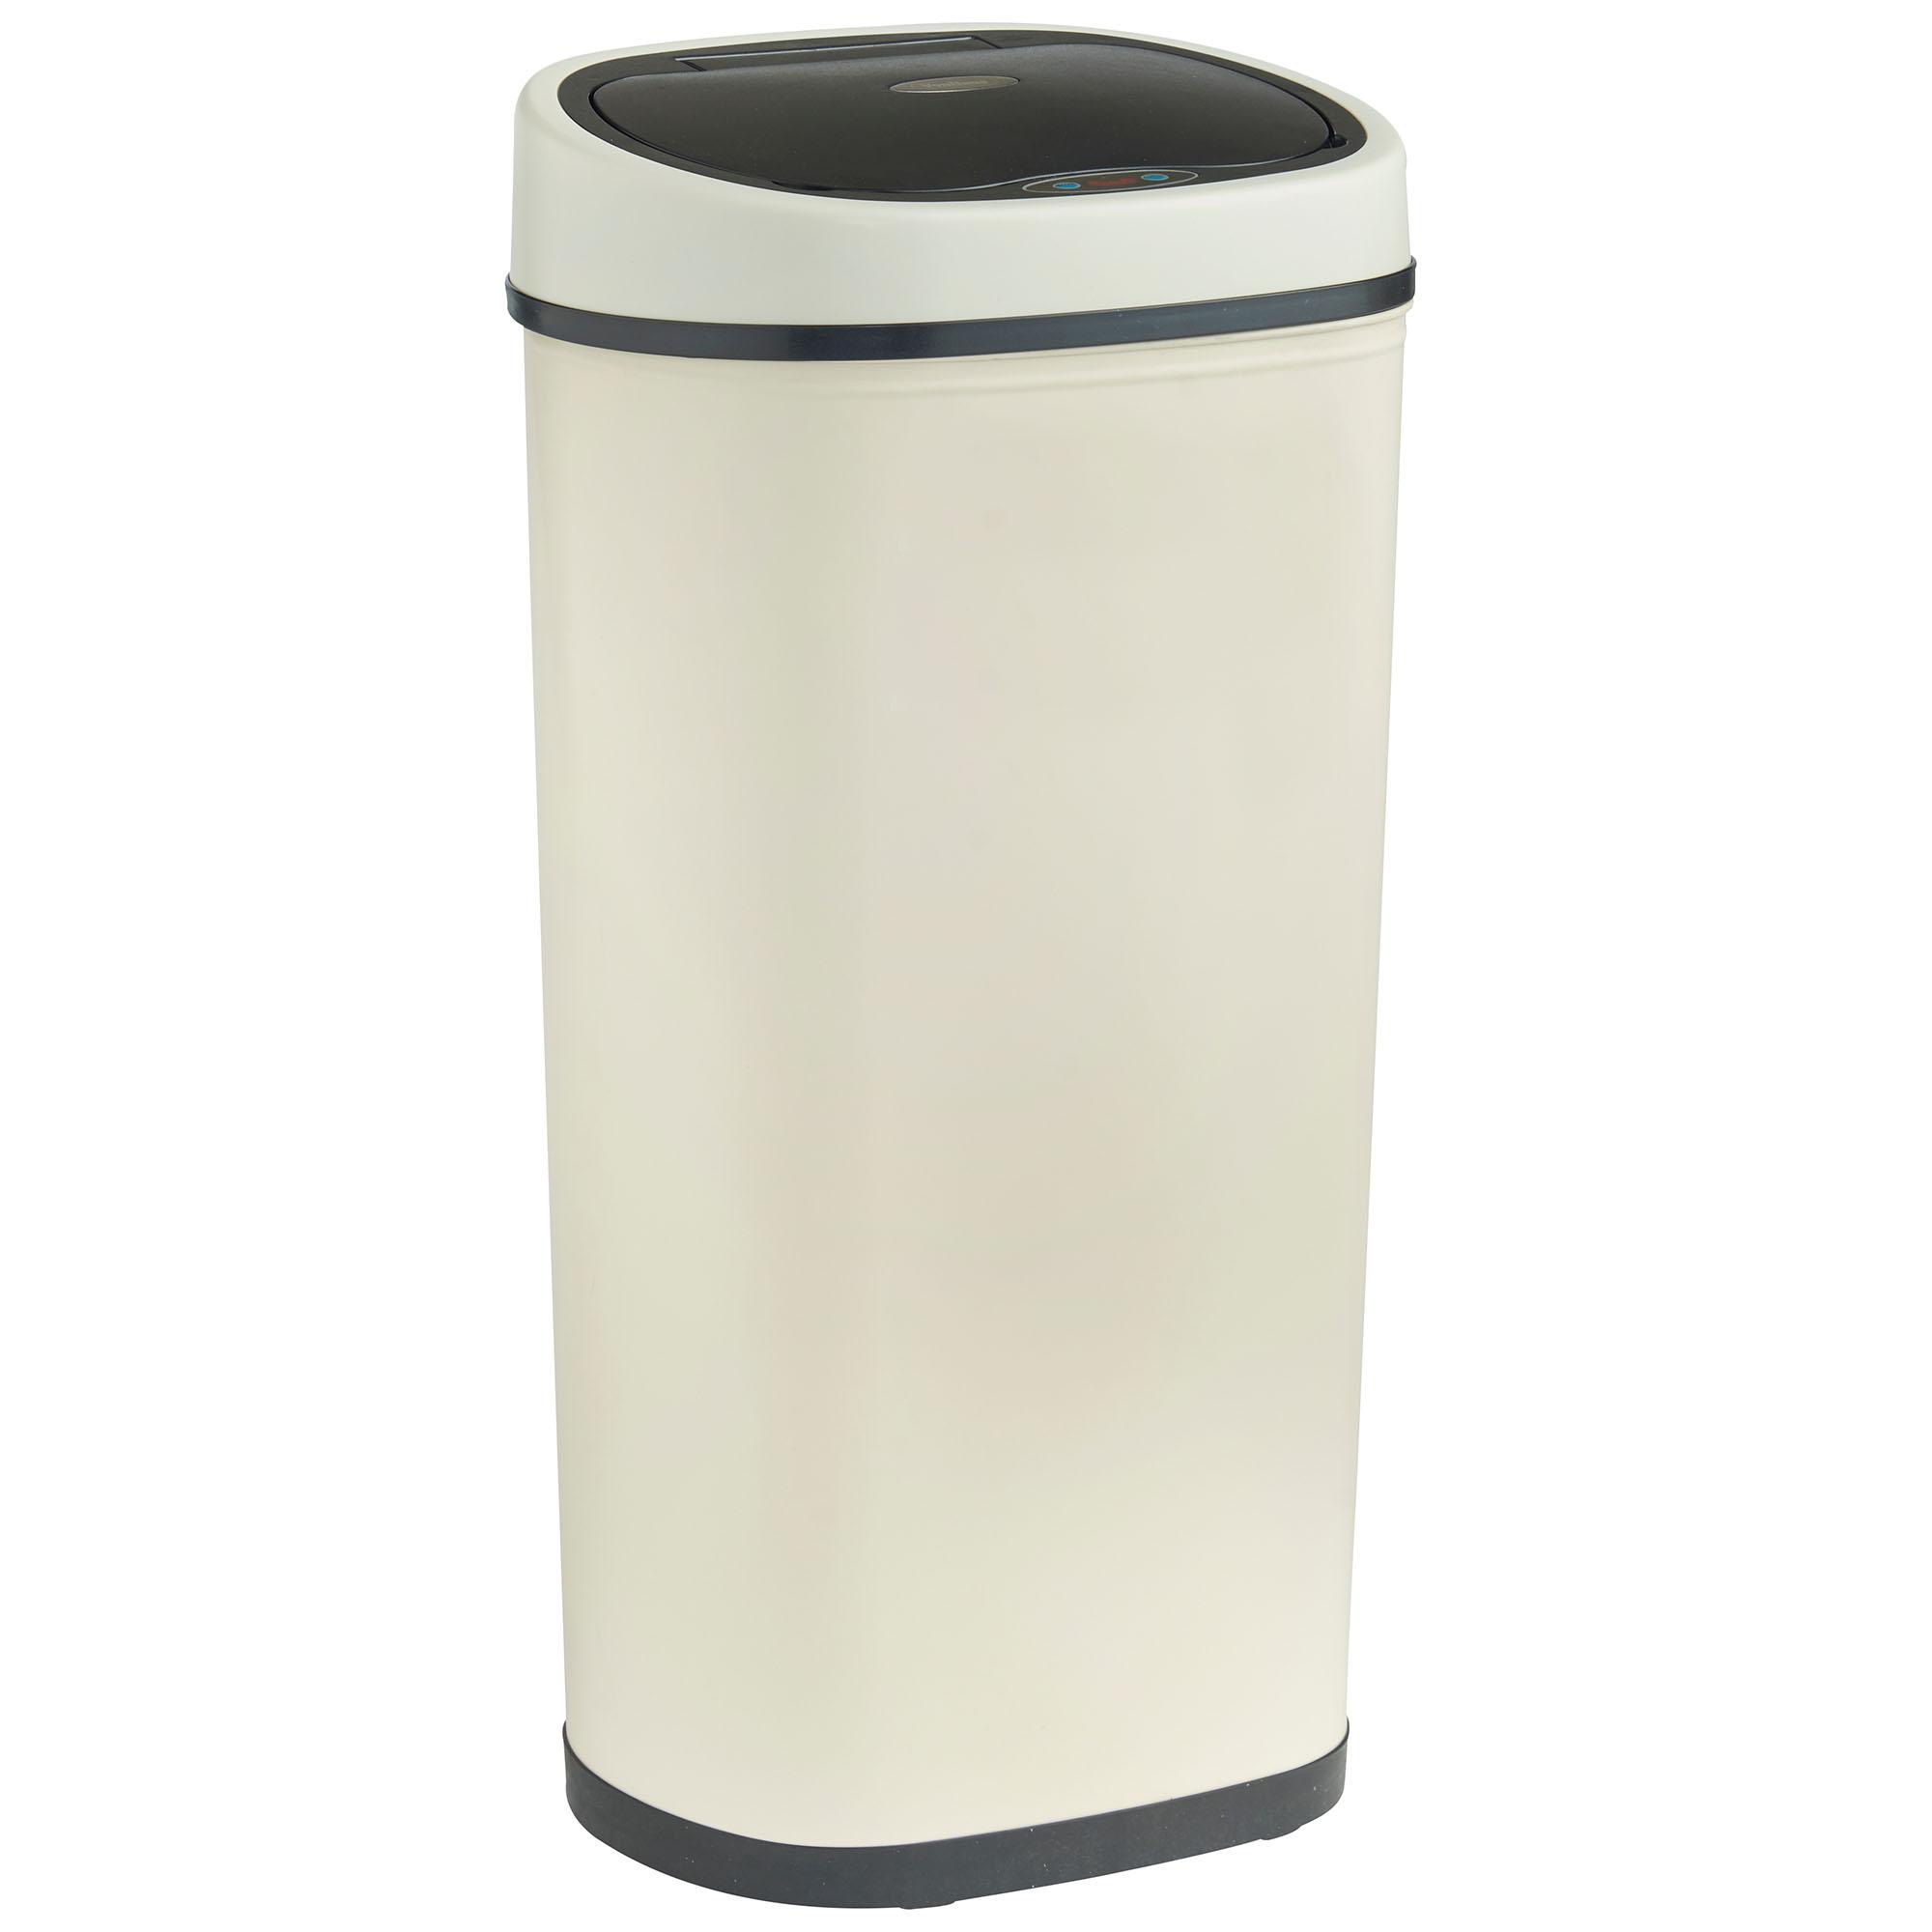 VonHaus 50L Kitchen Bin Automatic Sensor Touchless Open